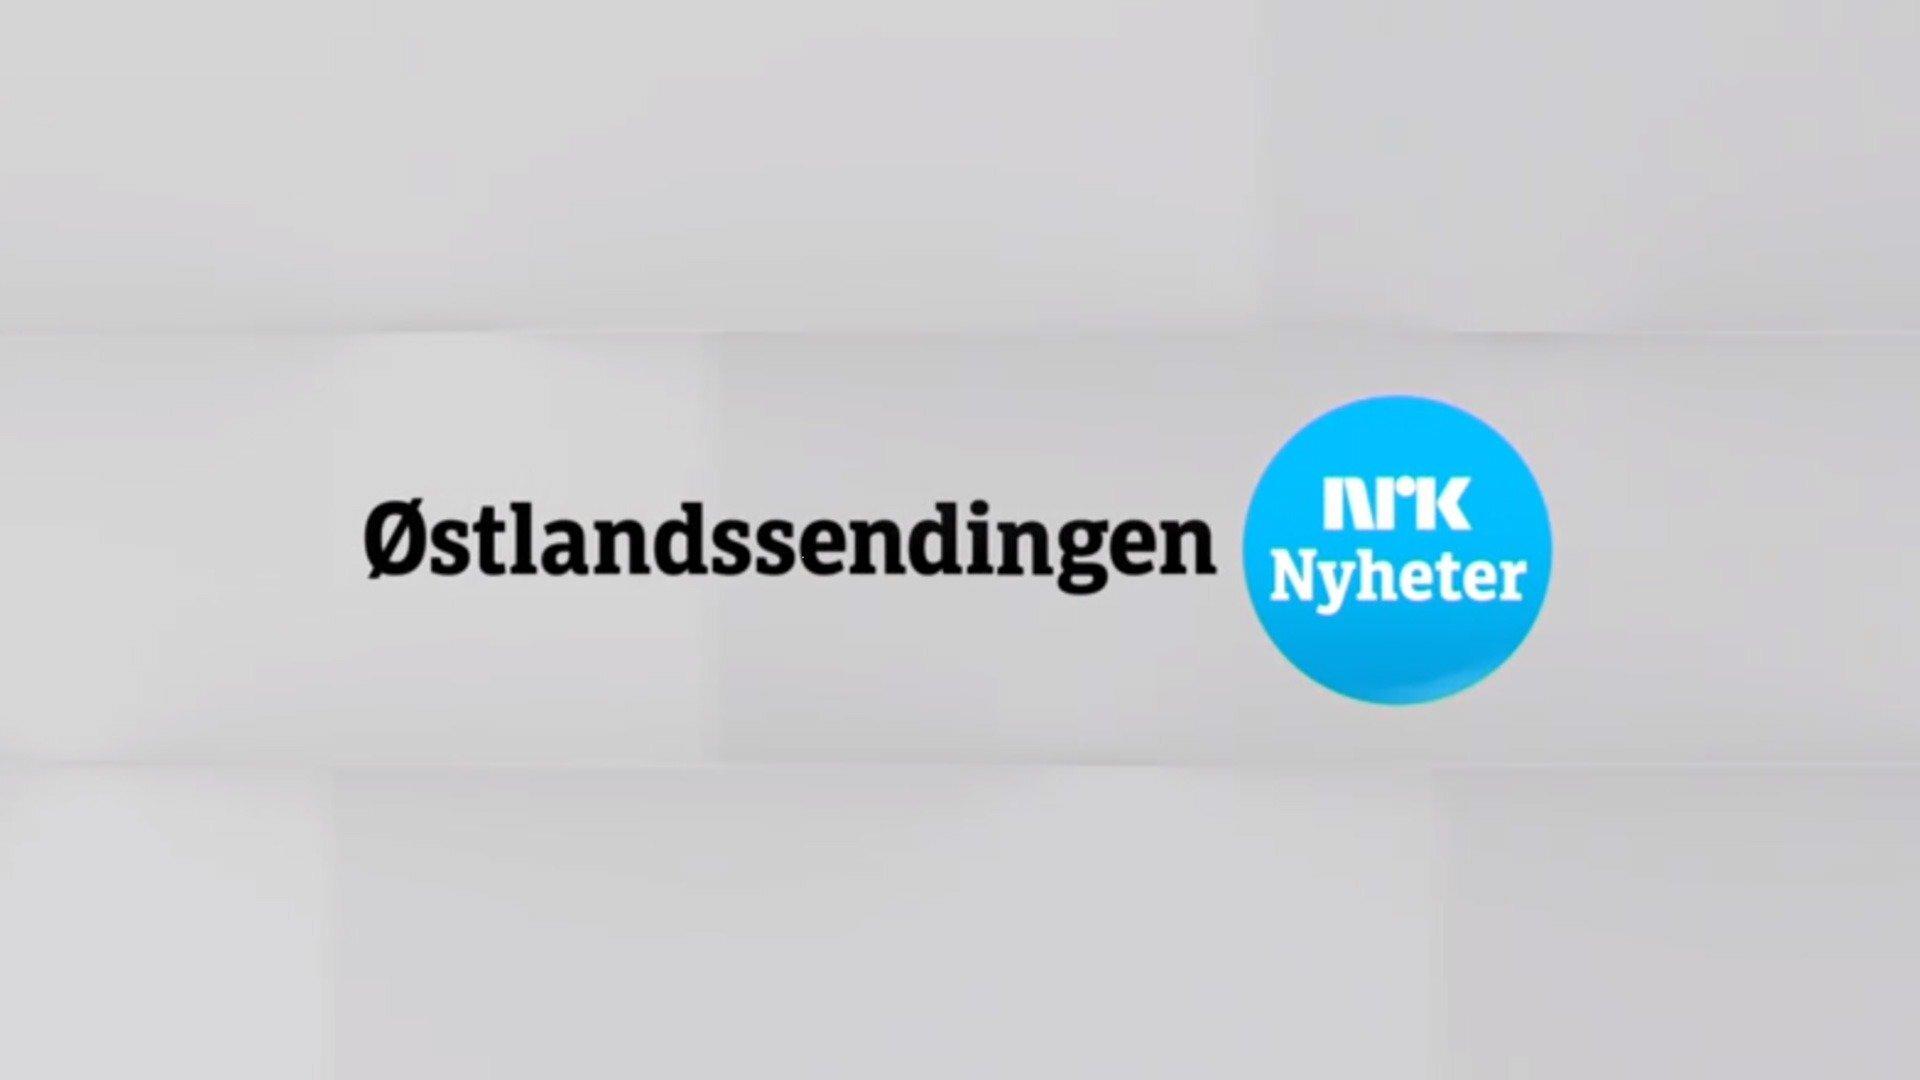 Distriktsnyheter Østlandssendingen